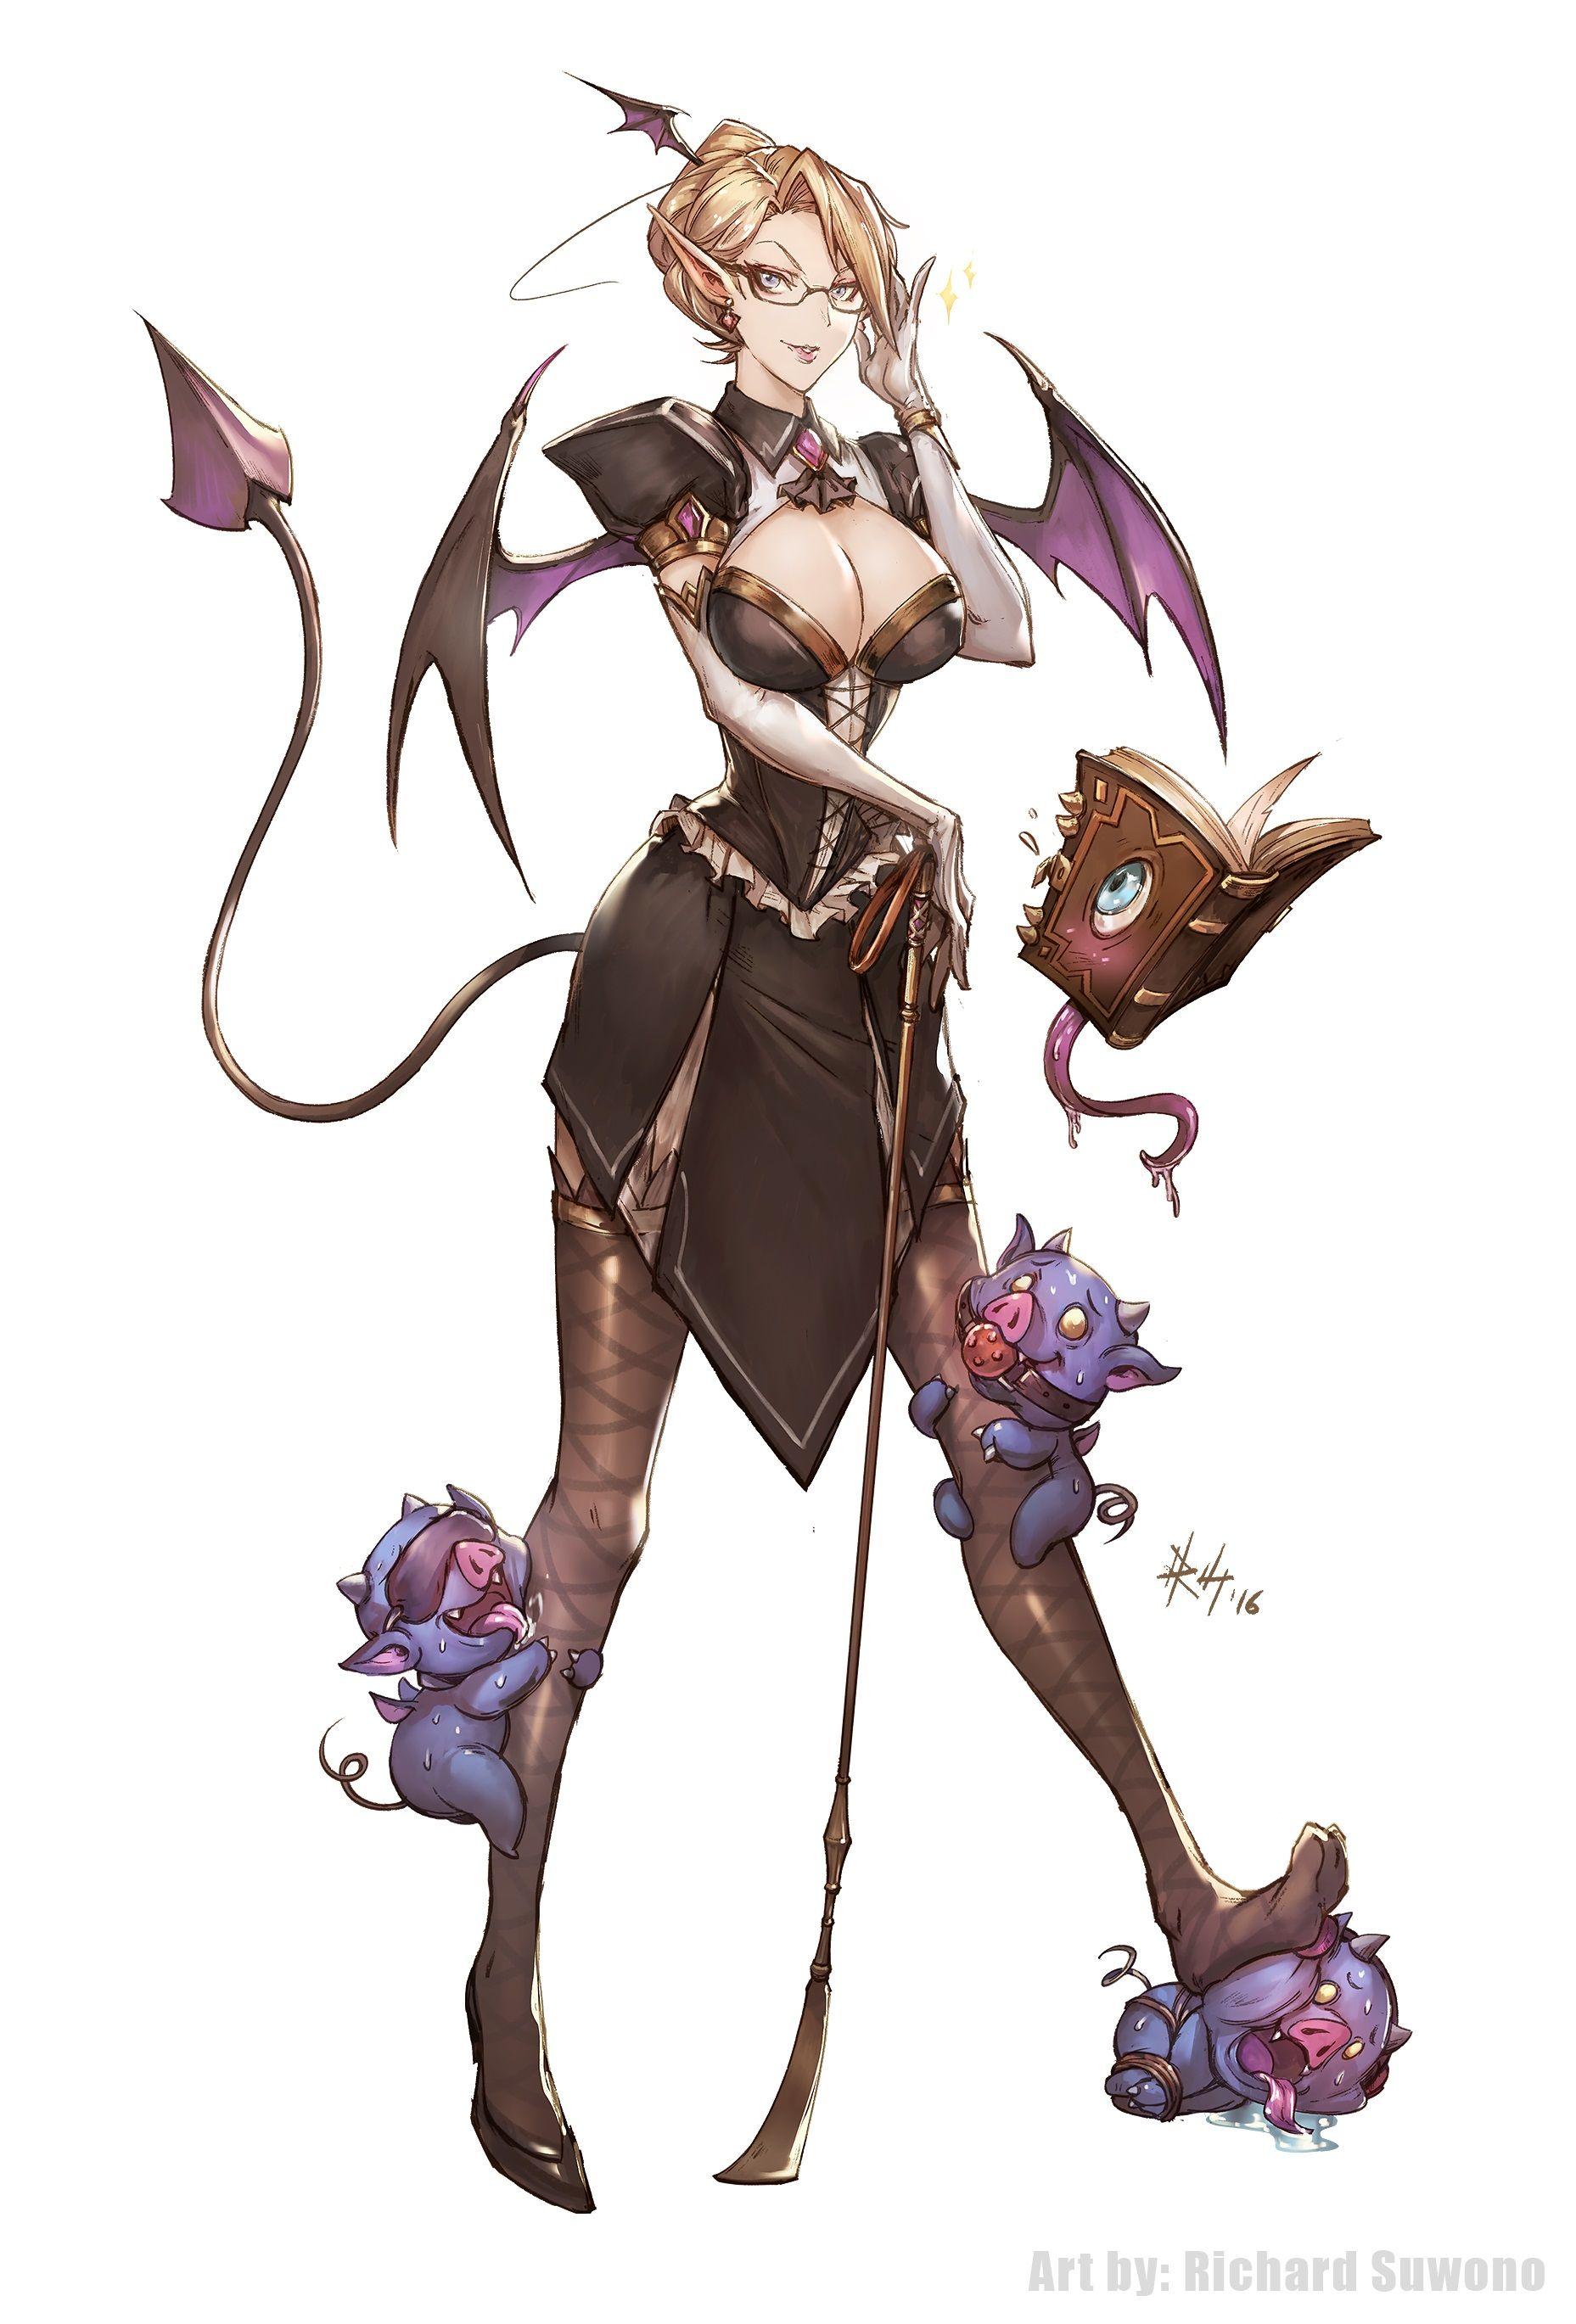 Pin By Erasyl Kabylbekov On Anime Art Concept Art Characters Fantasy Character Design Fantasy Girl